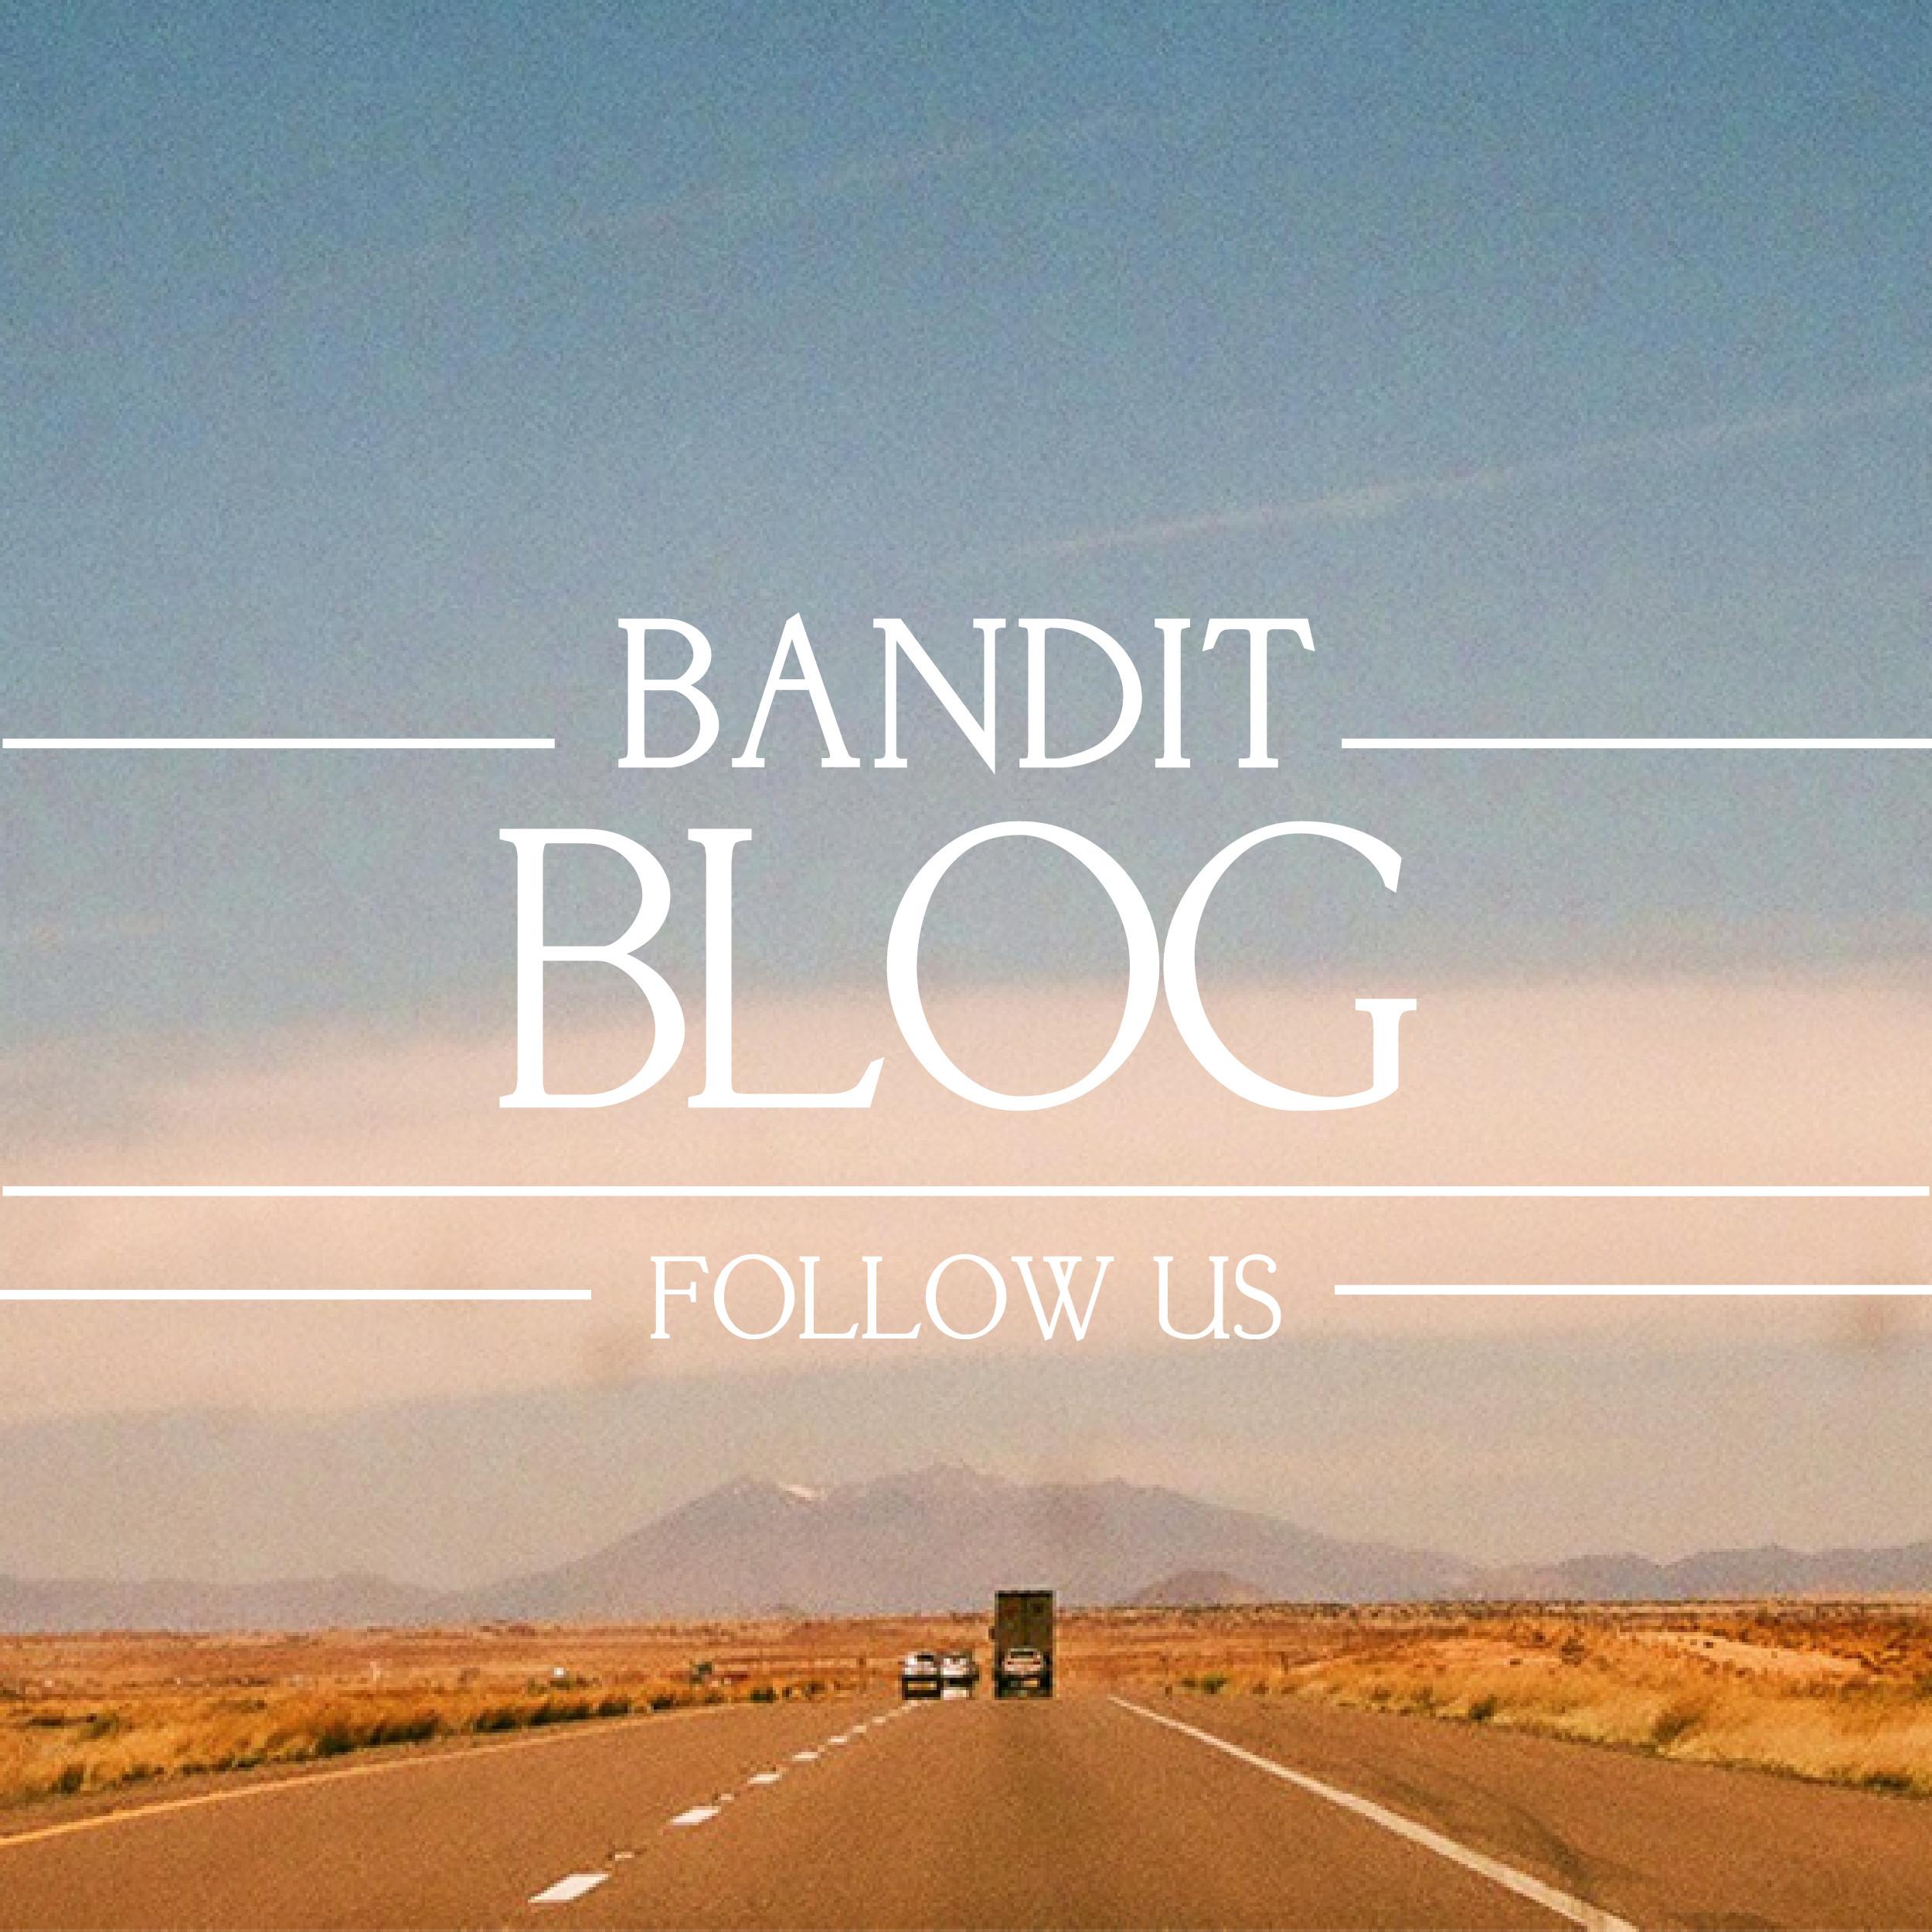 The 2 Bandits | The 2 Bandits